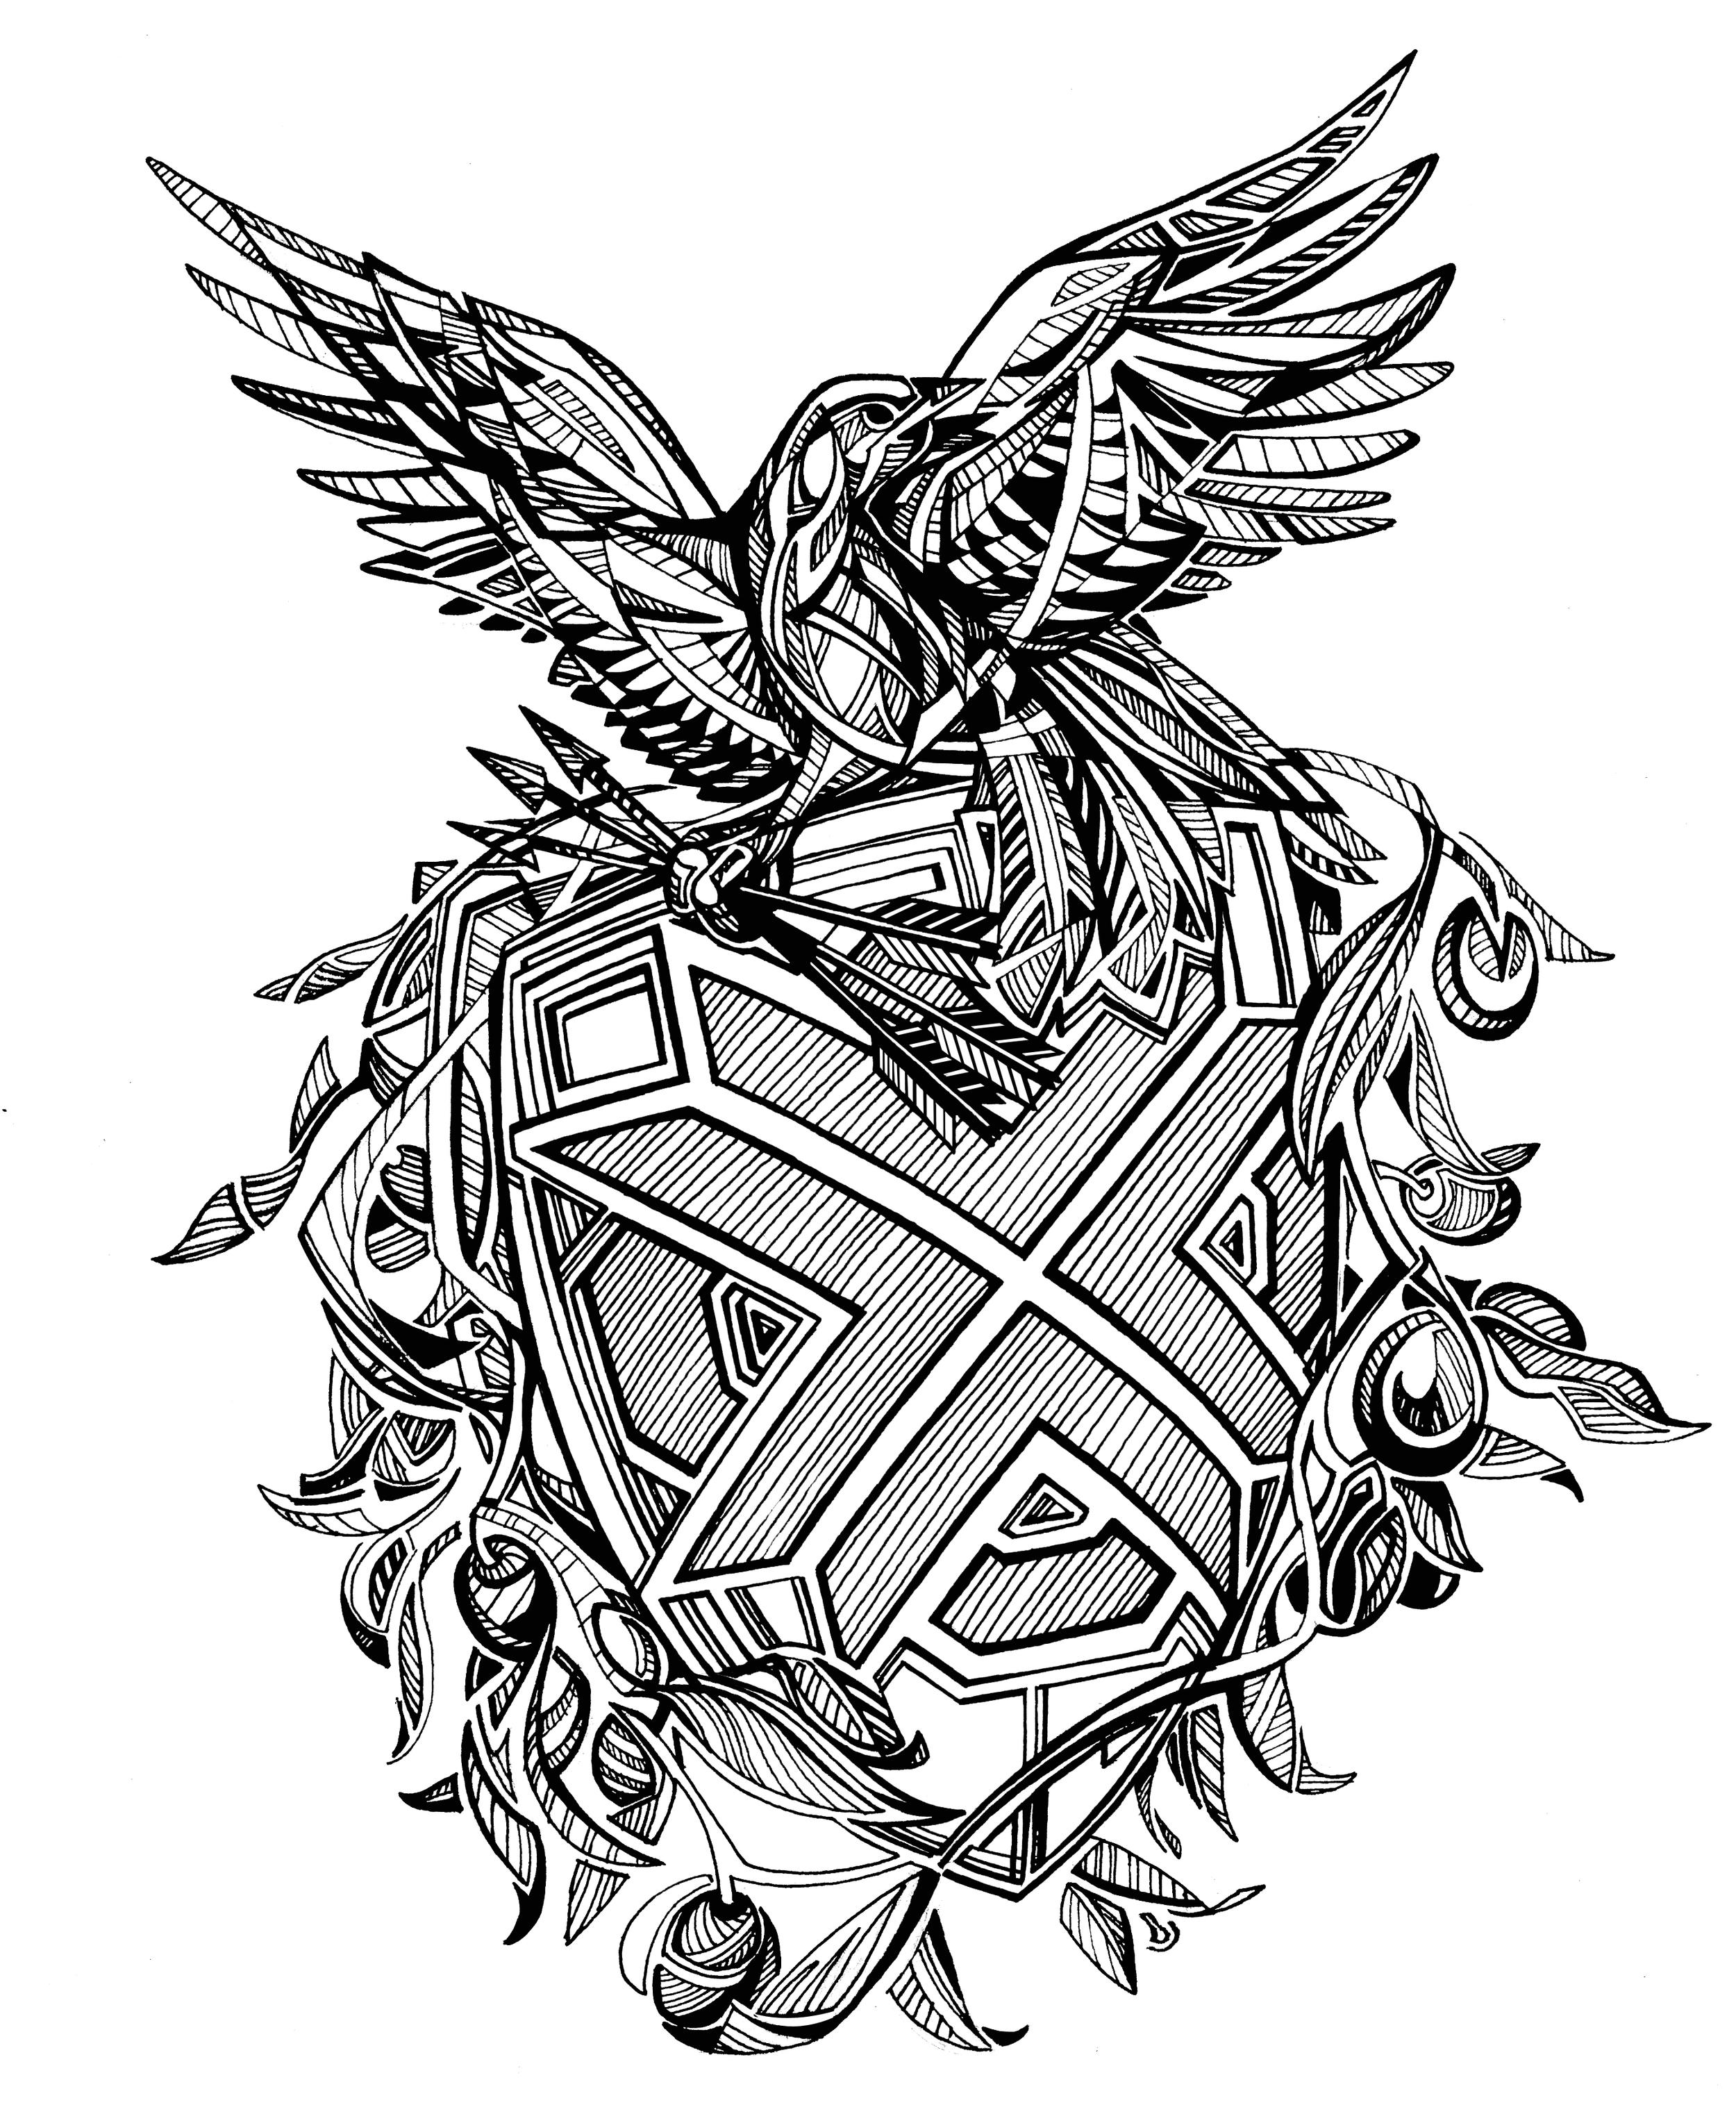 crest phalanx.jpg